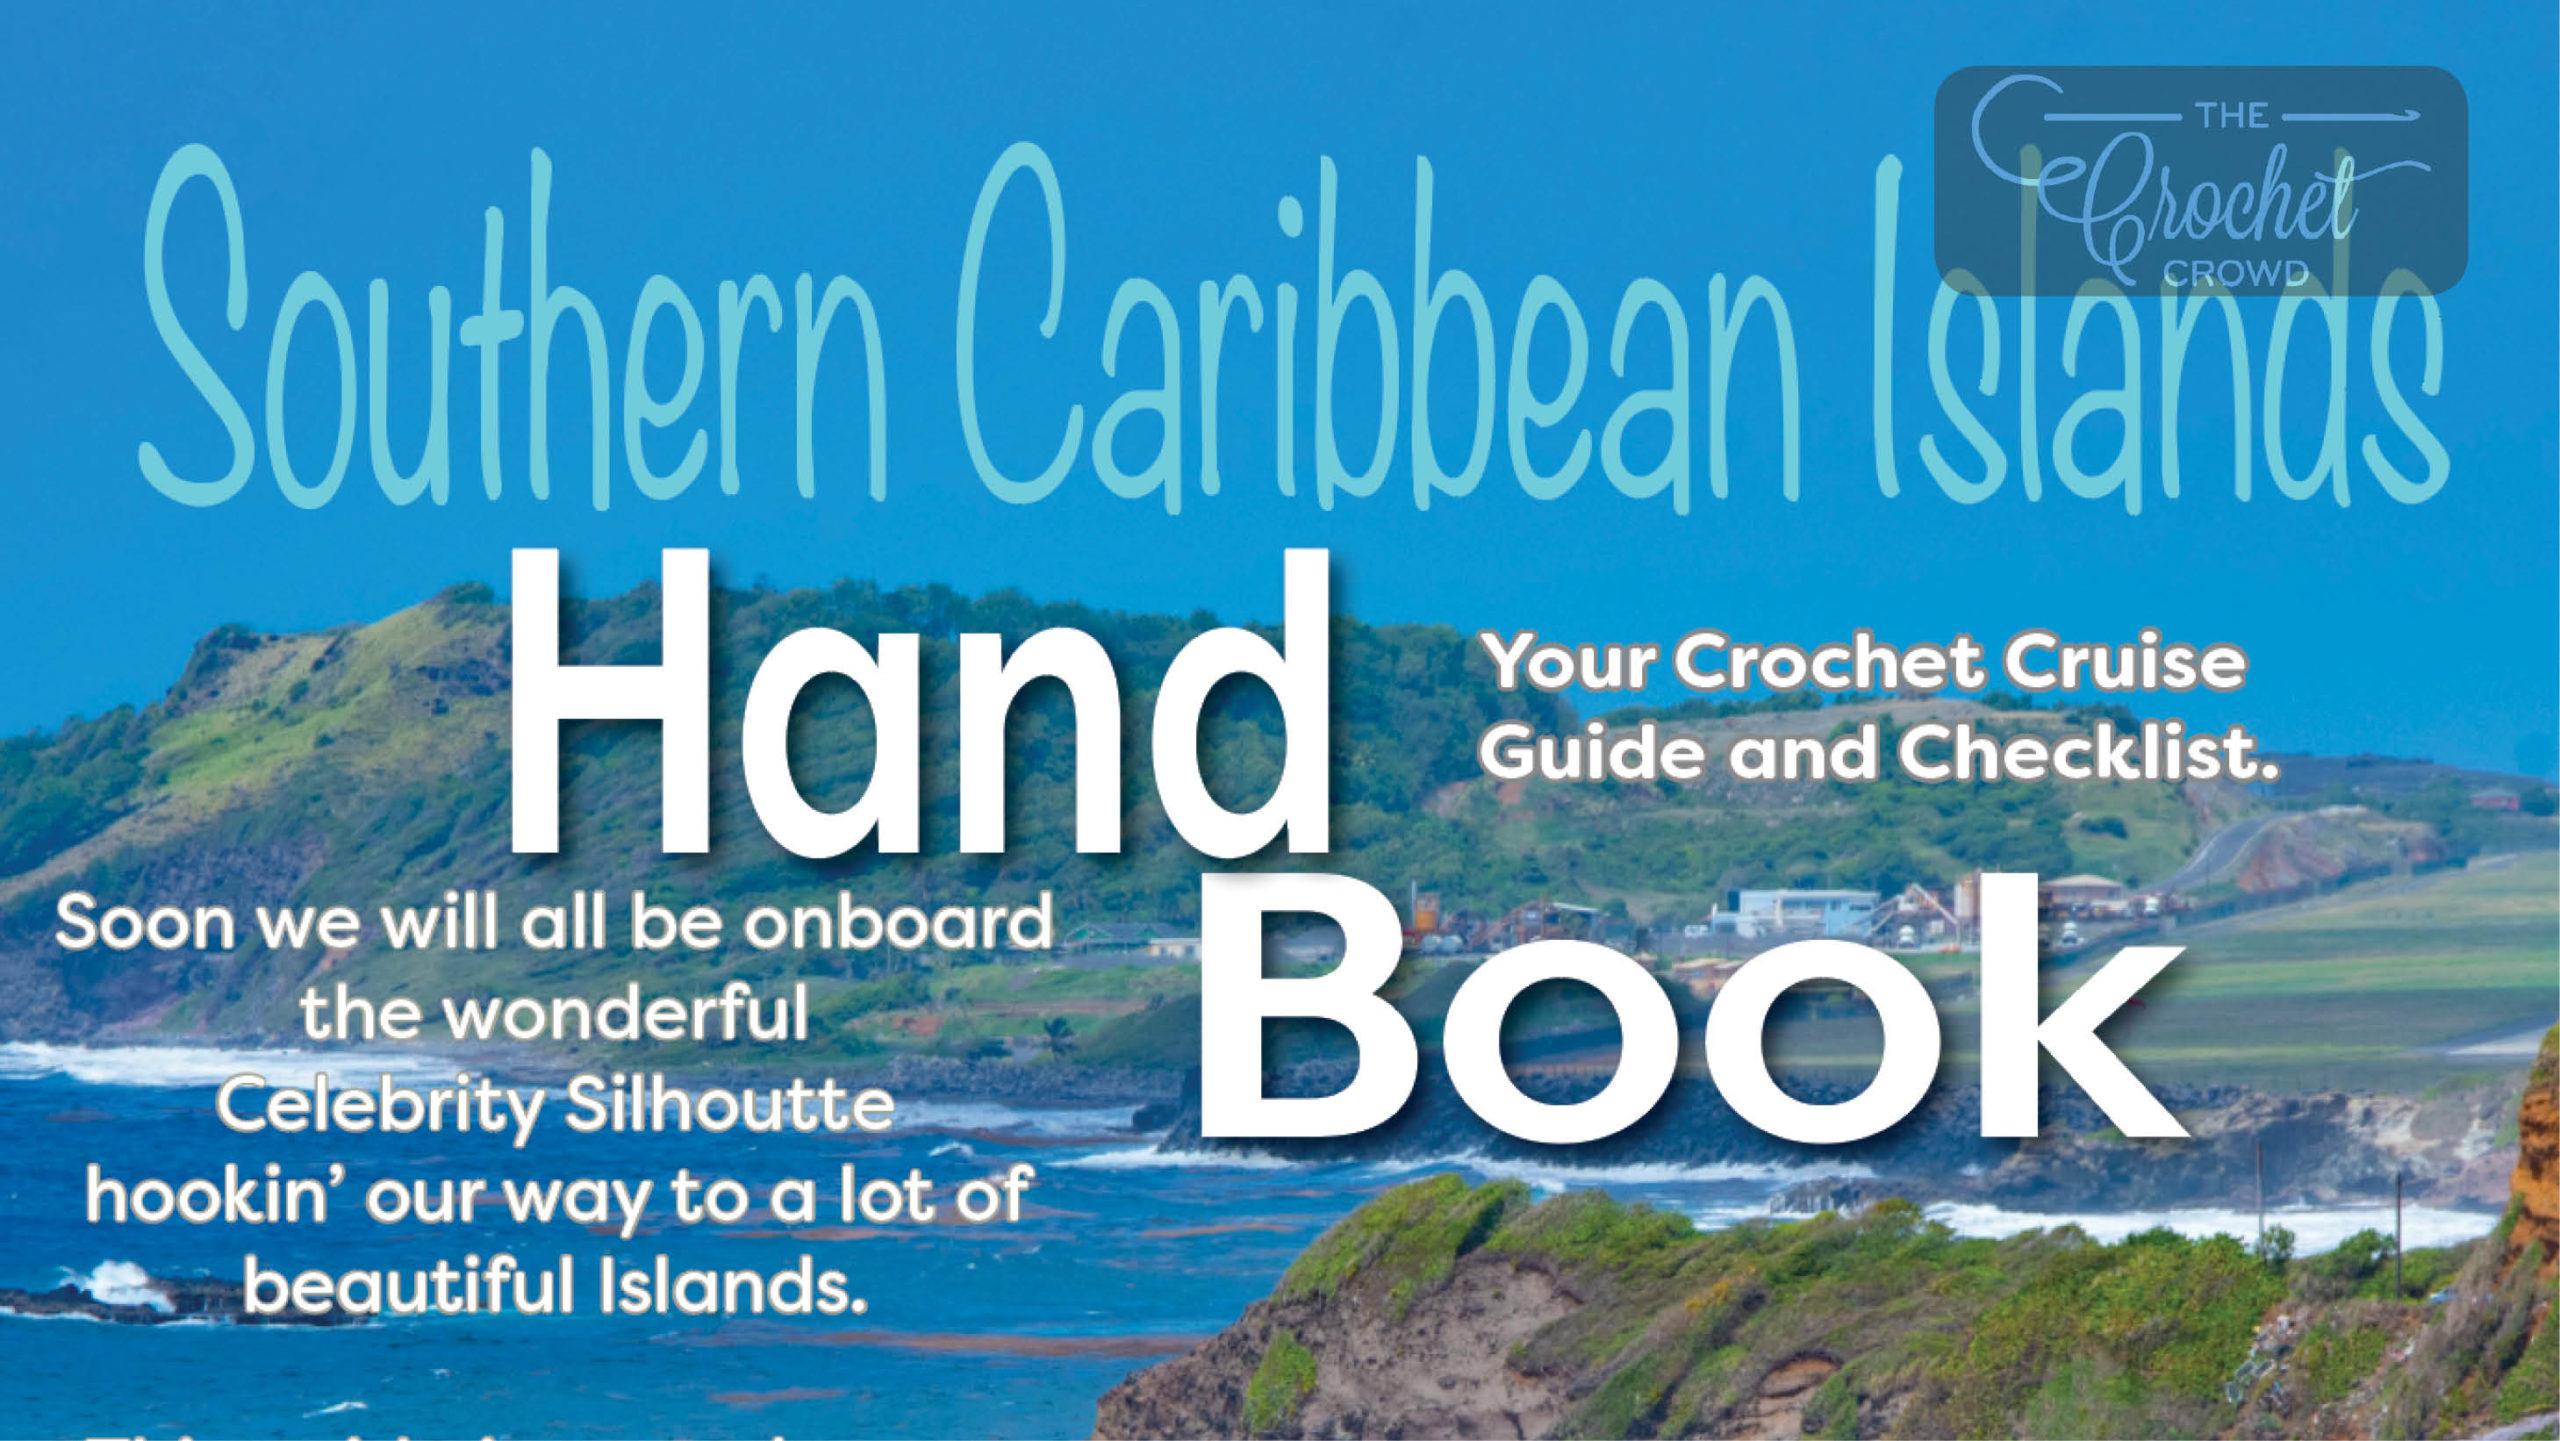 Southern Caribbean Cruise 2020.Southern Caribbean Crochet Cruise Handbook The Crochet Crowd